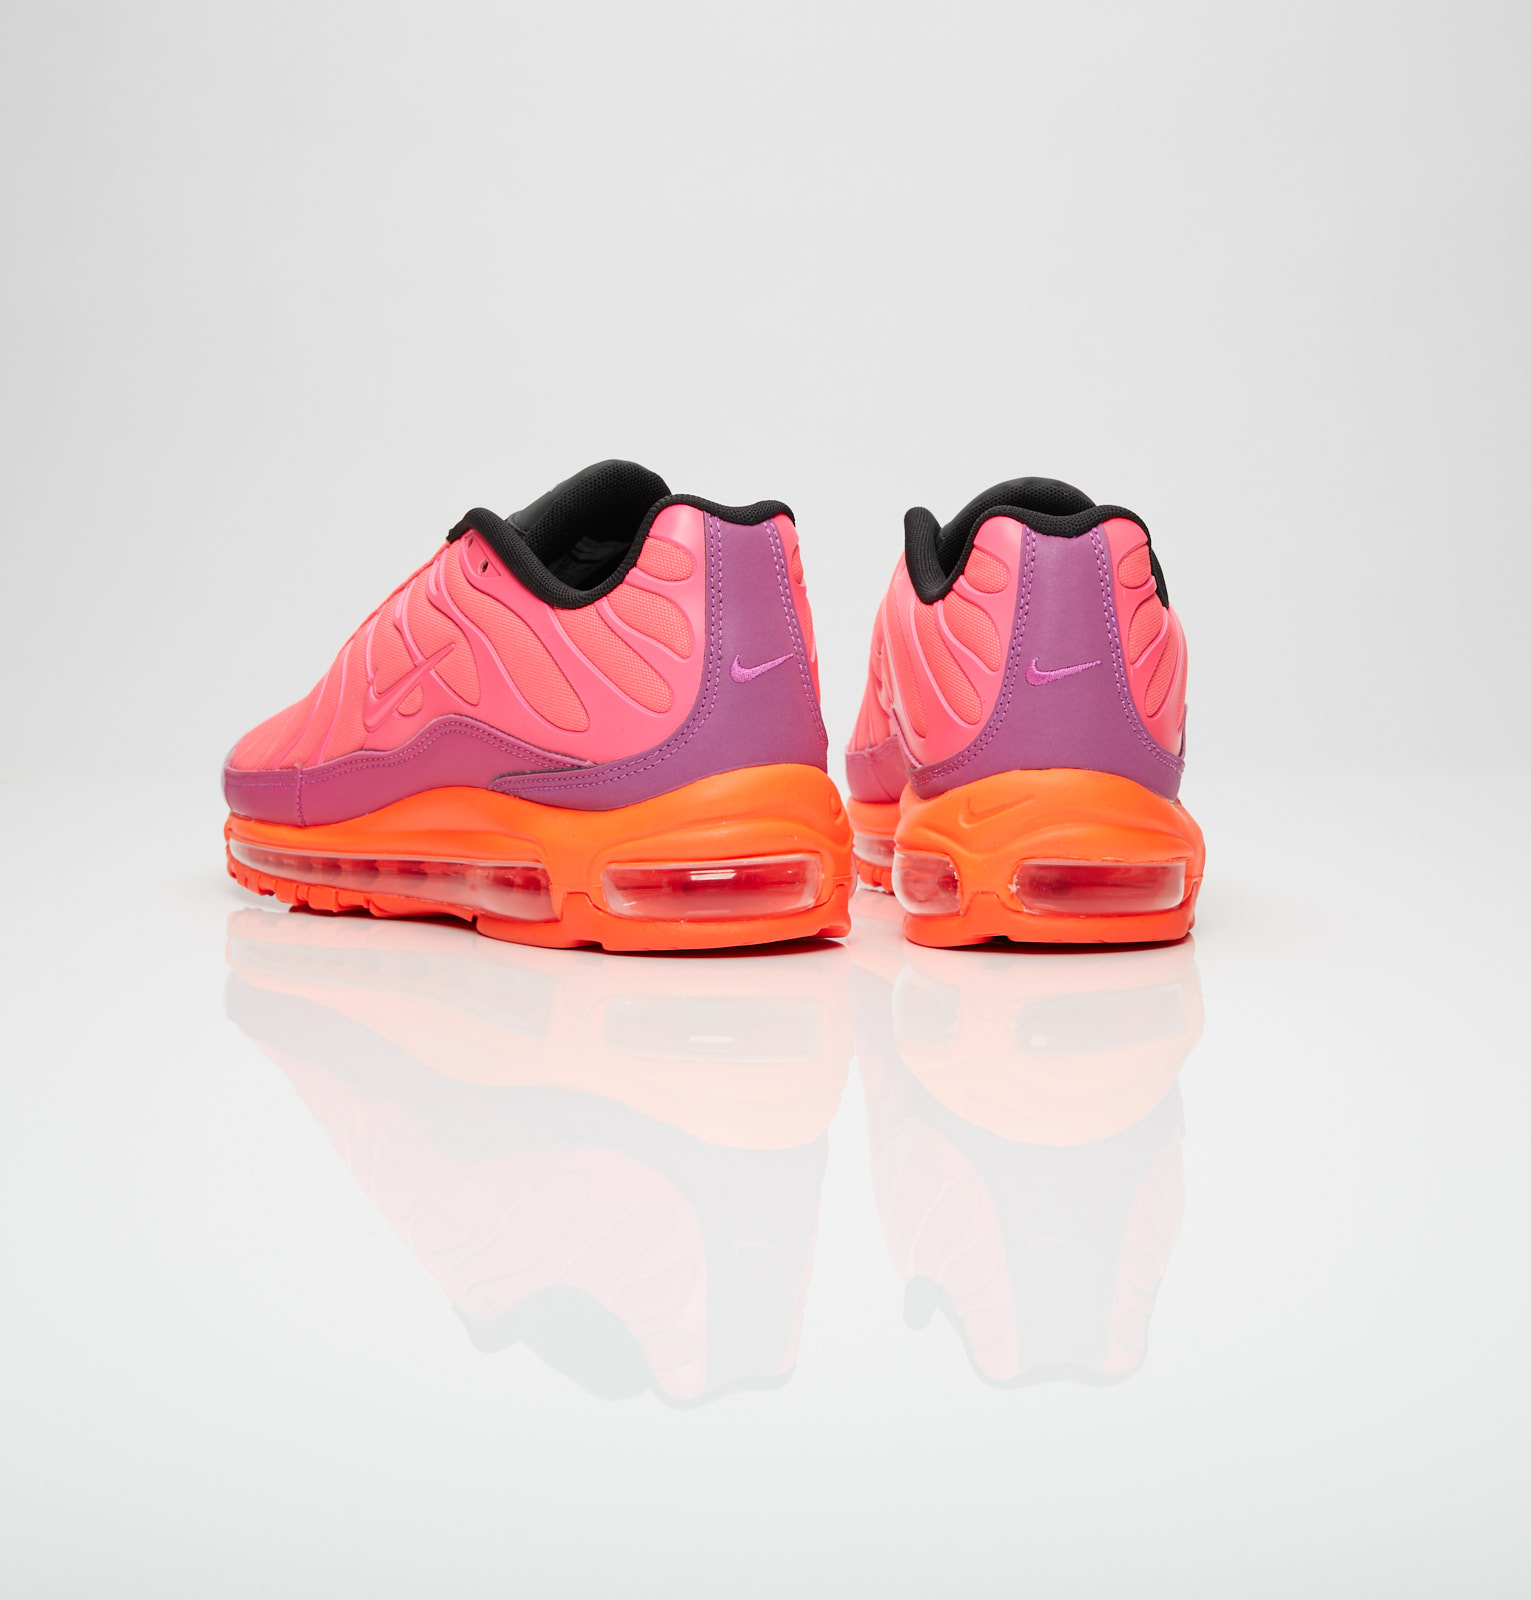 553ec2b663df Nike Air Max 97 Plus - Ah8144-600 - Sneakersnstuff